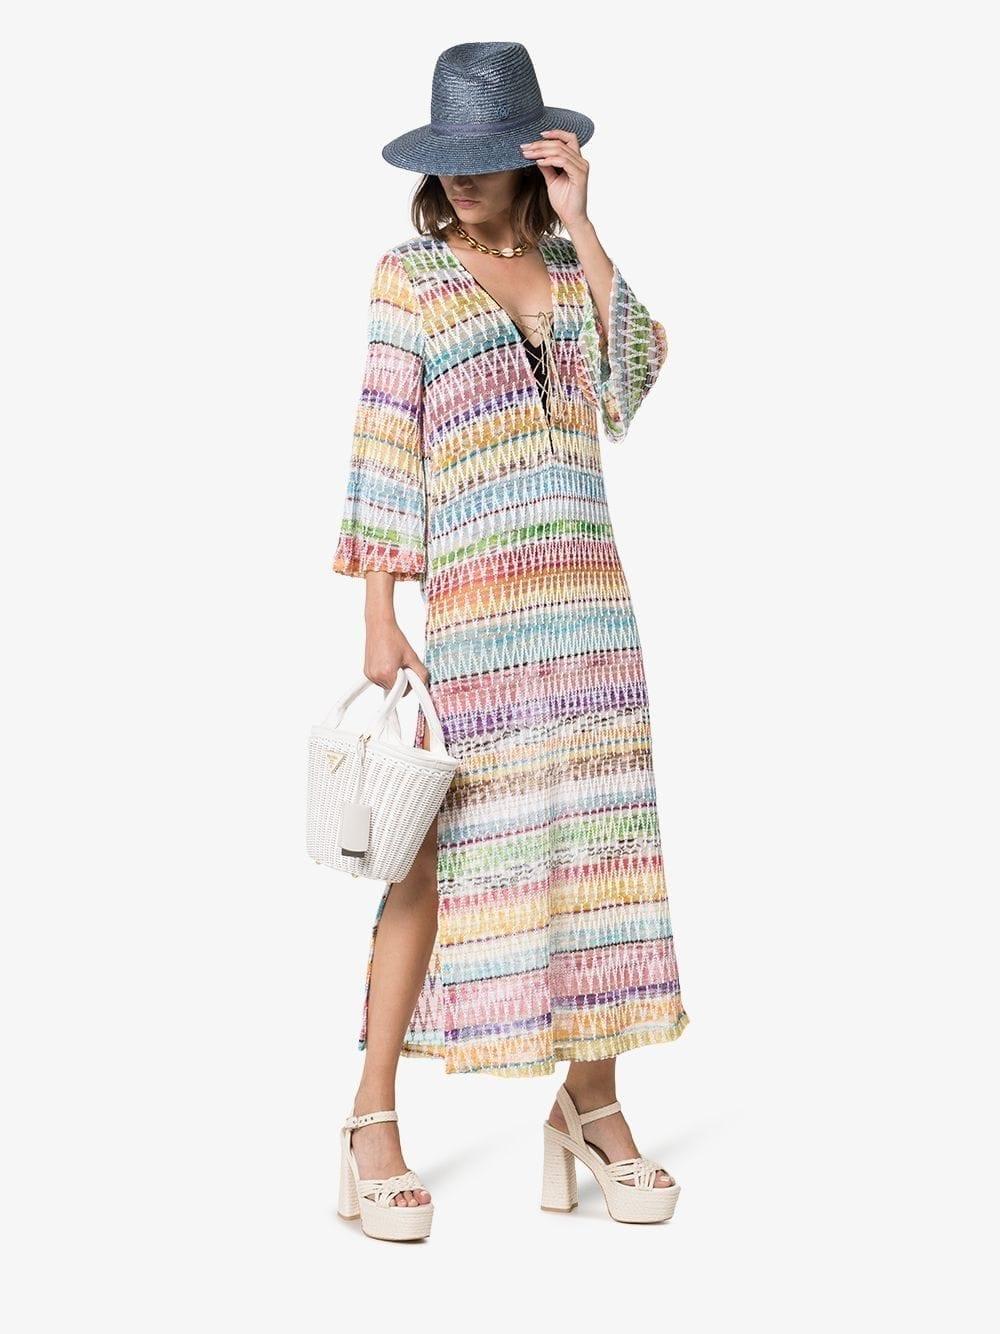 5dcfc8f5eb373 MISSONI MARE Zig-zag Kaftan Dress - We Select Dresses